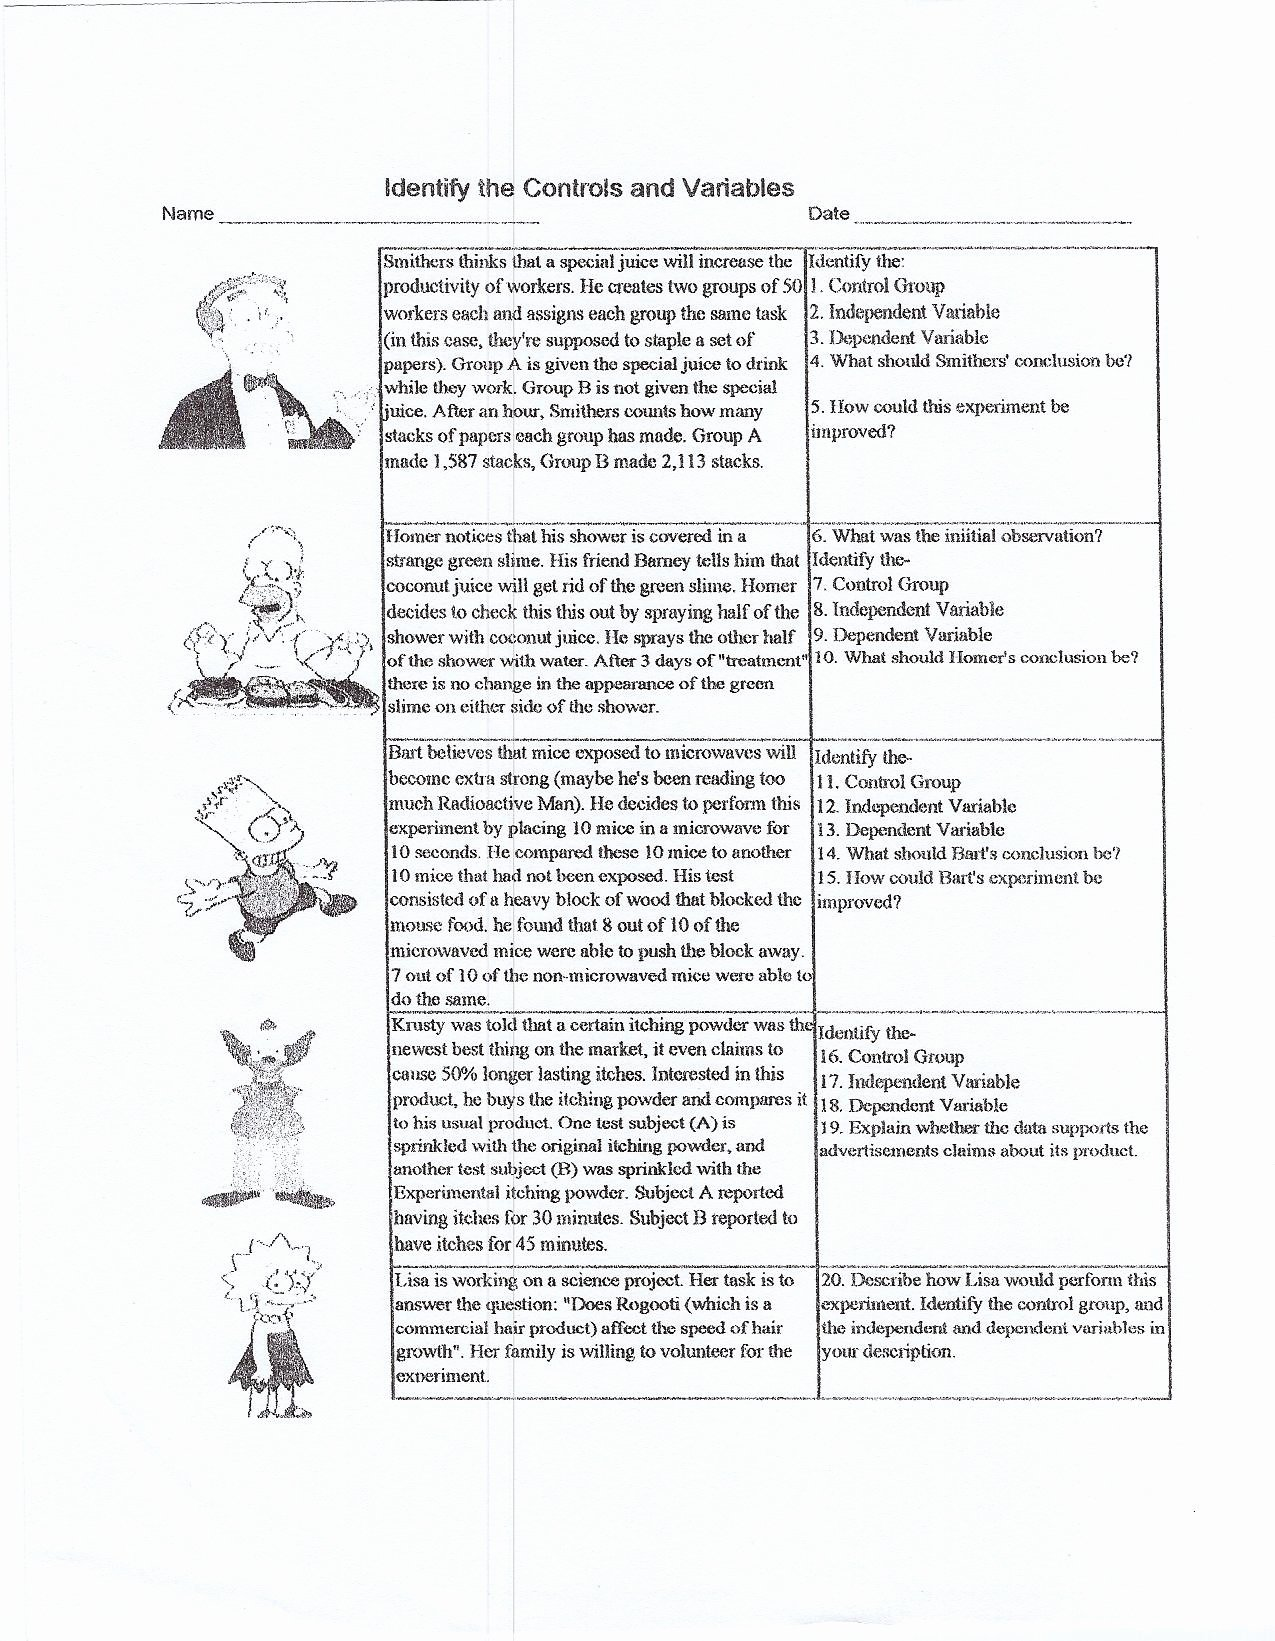 Identifying Variables Worksheet Middle School Best Of Independent and Dependent Variables Worksheet Middle School